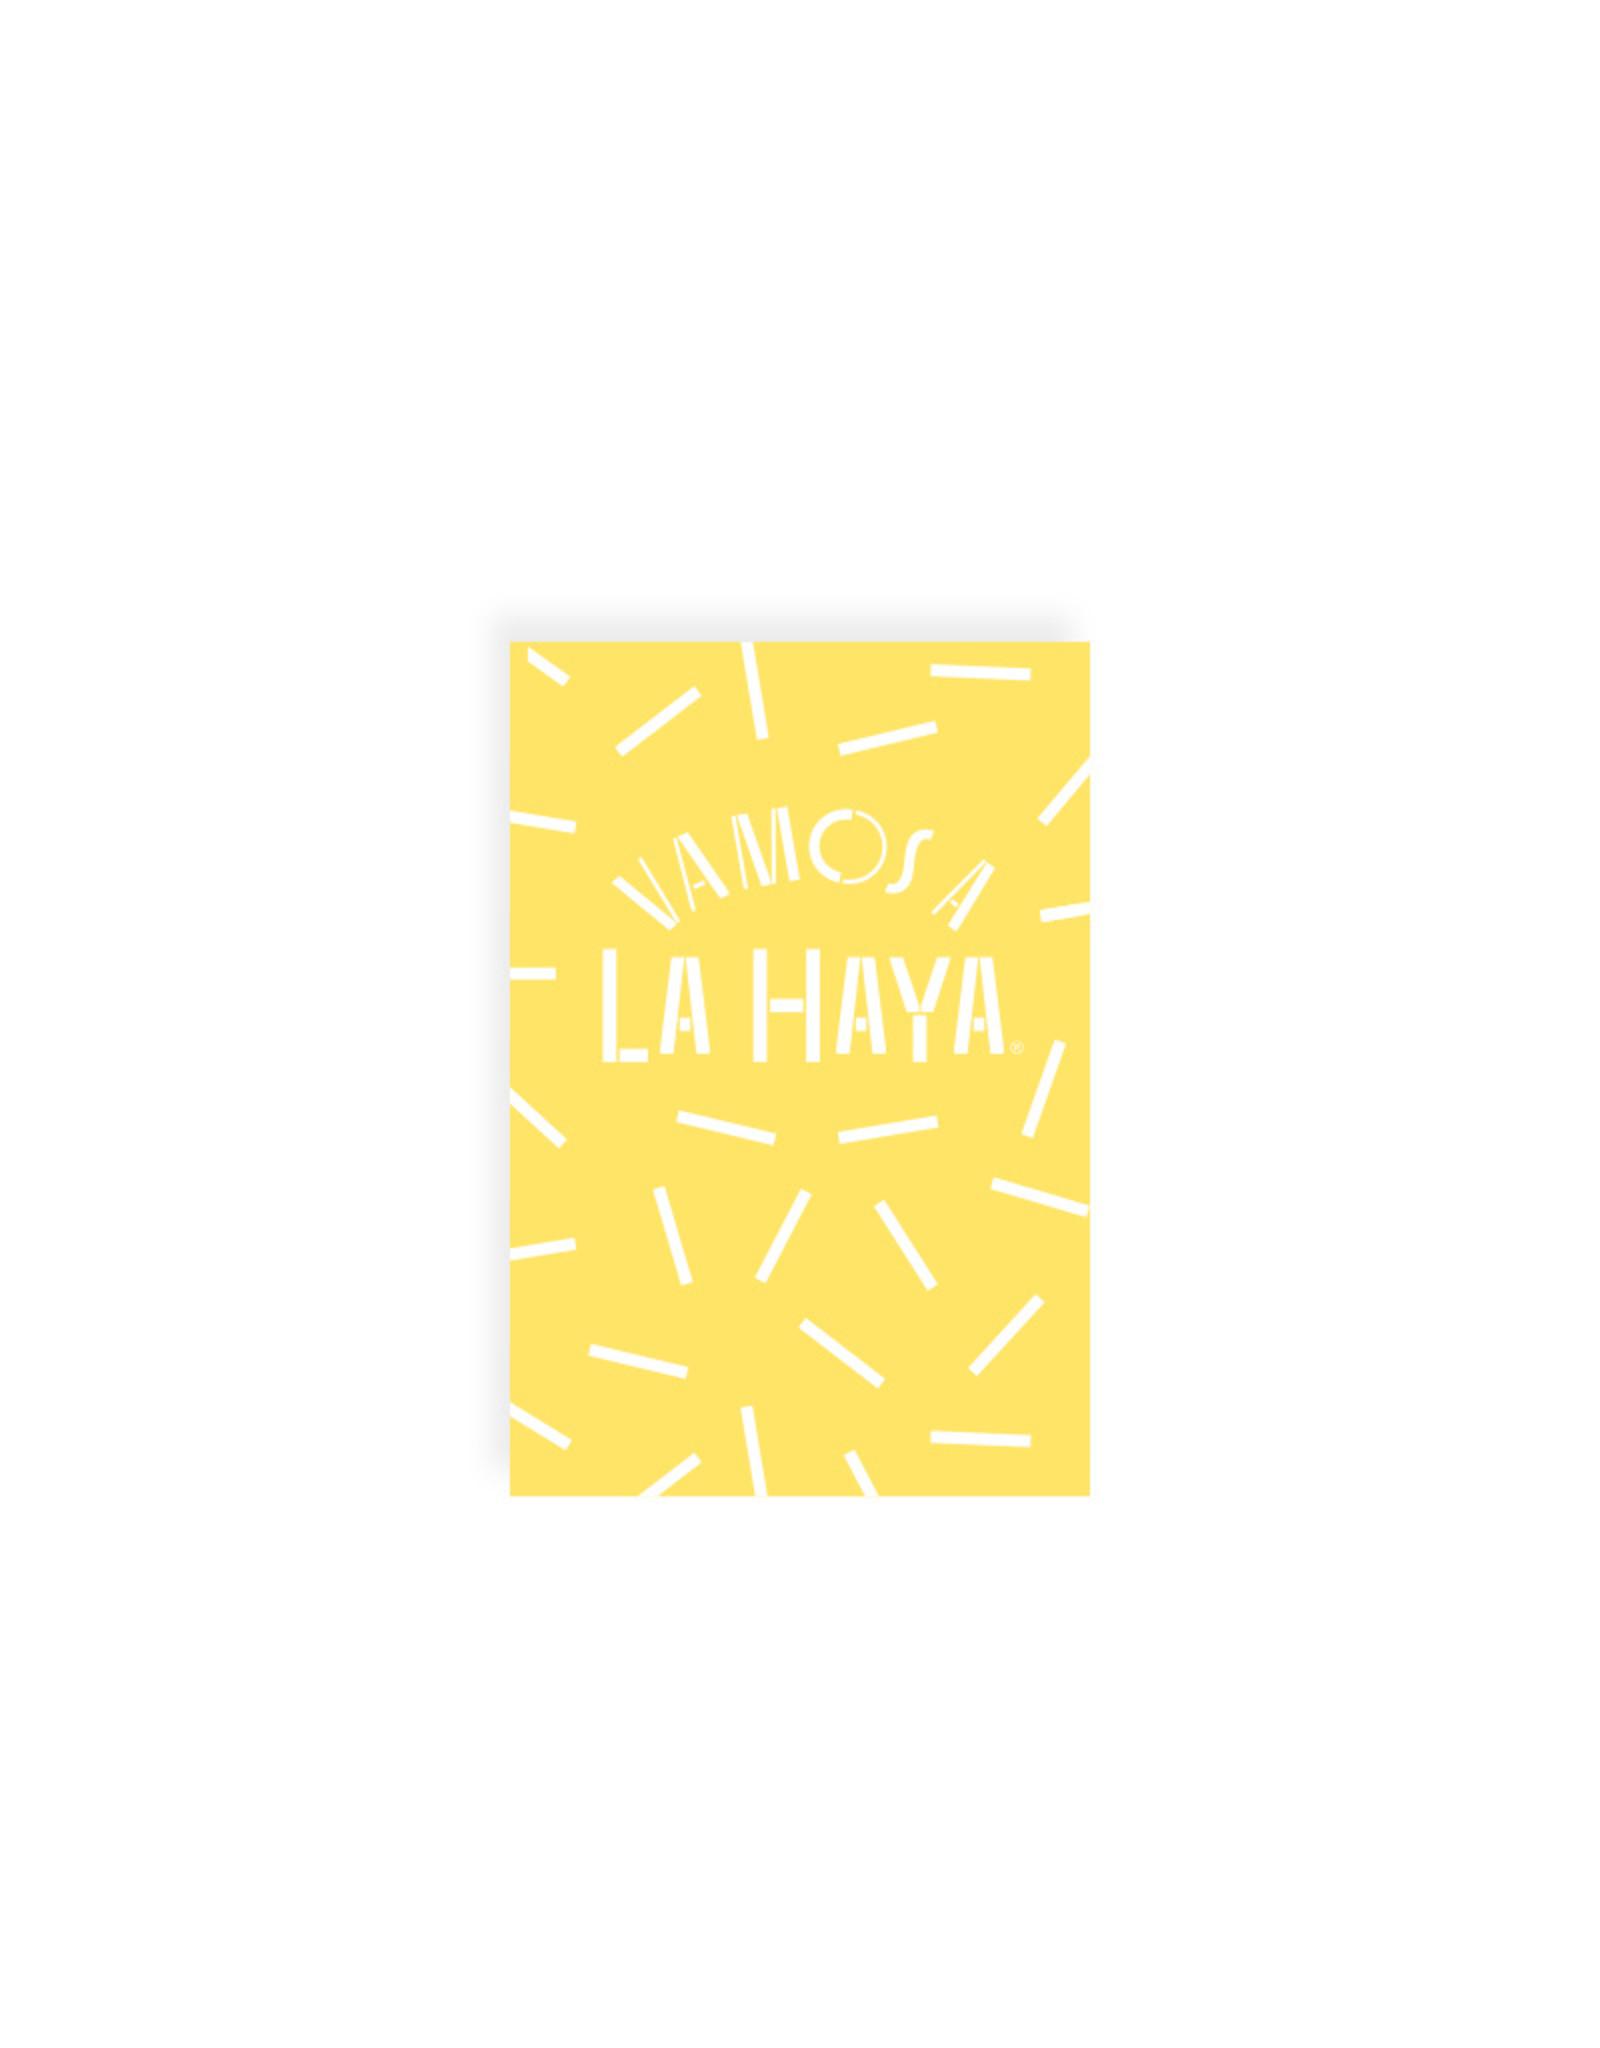 The Hague's Finest Ansichtkaart(en) - Vamos a La Haya